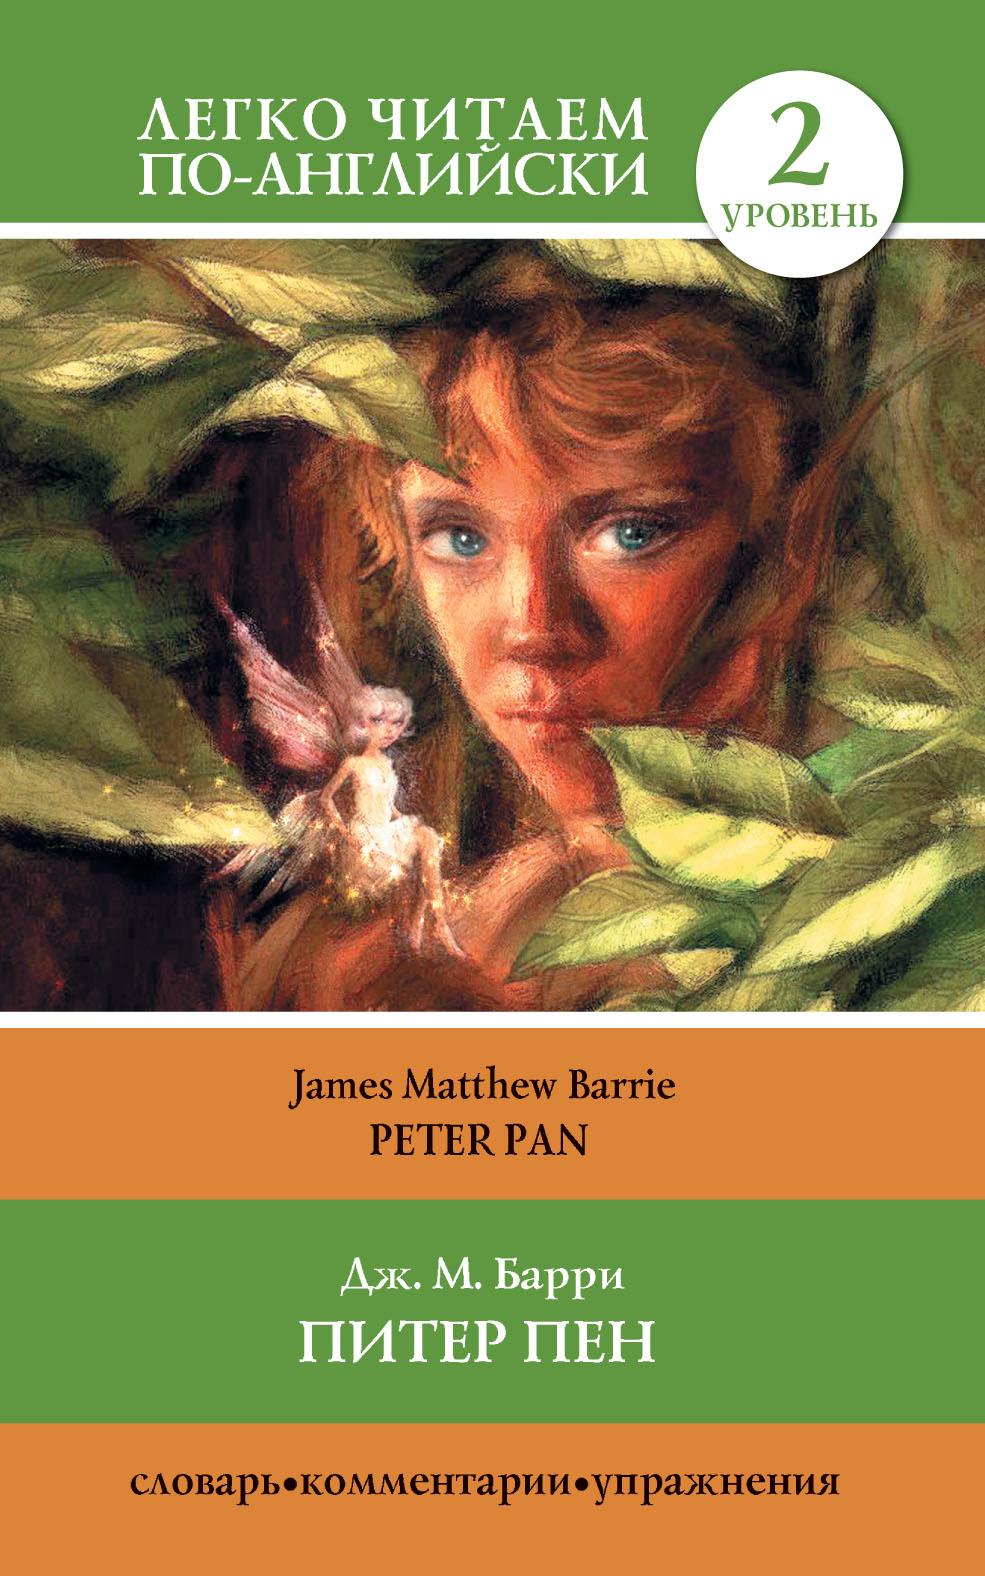 Джеймс Барри Питер Пен / Peter Pan недорого